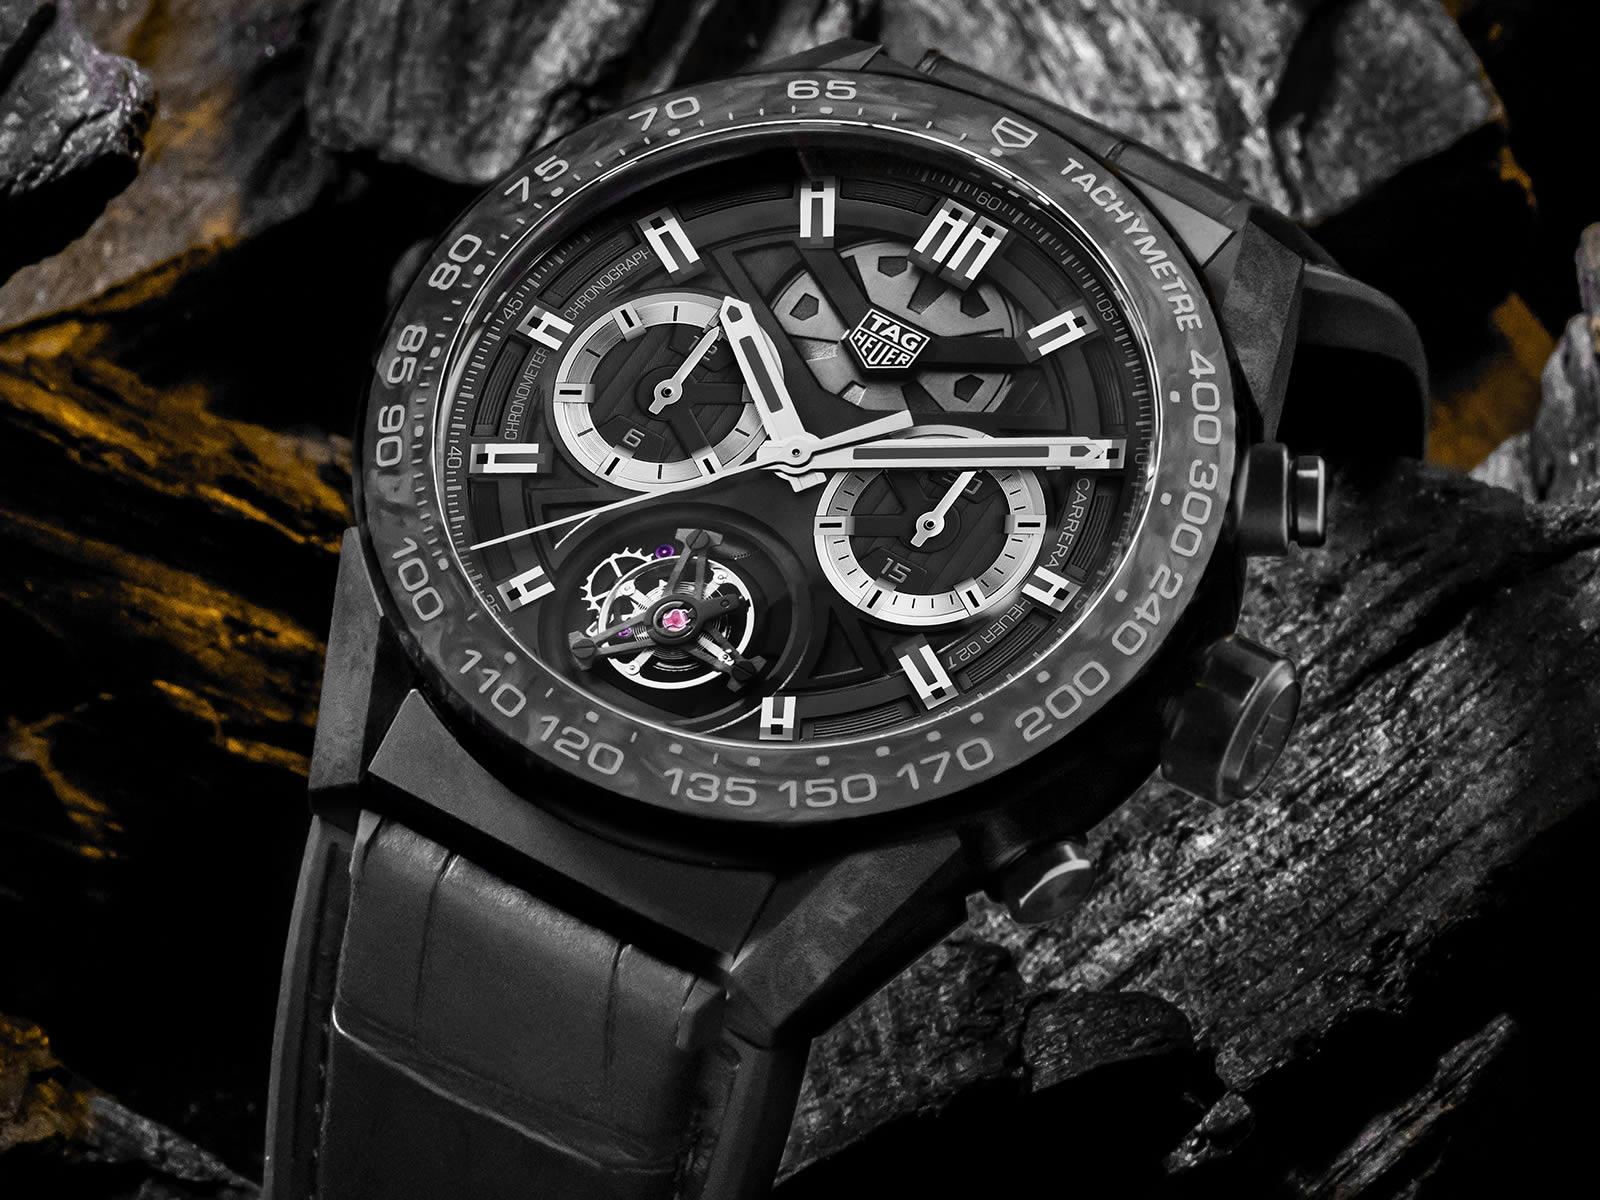 car5a8p-fc6415-tag-heuer-carrera-calibre-heuer02t-automatic-watch-45-mm-2-.jpg